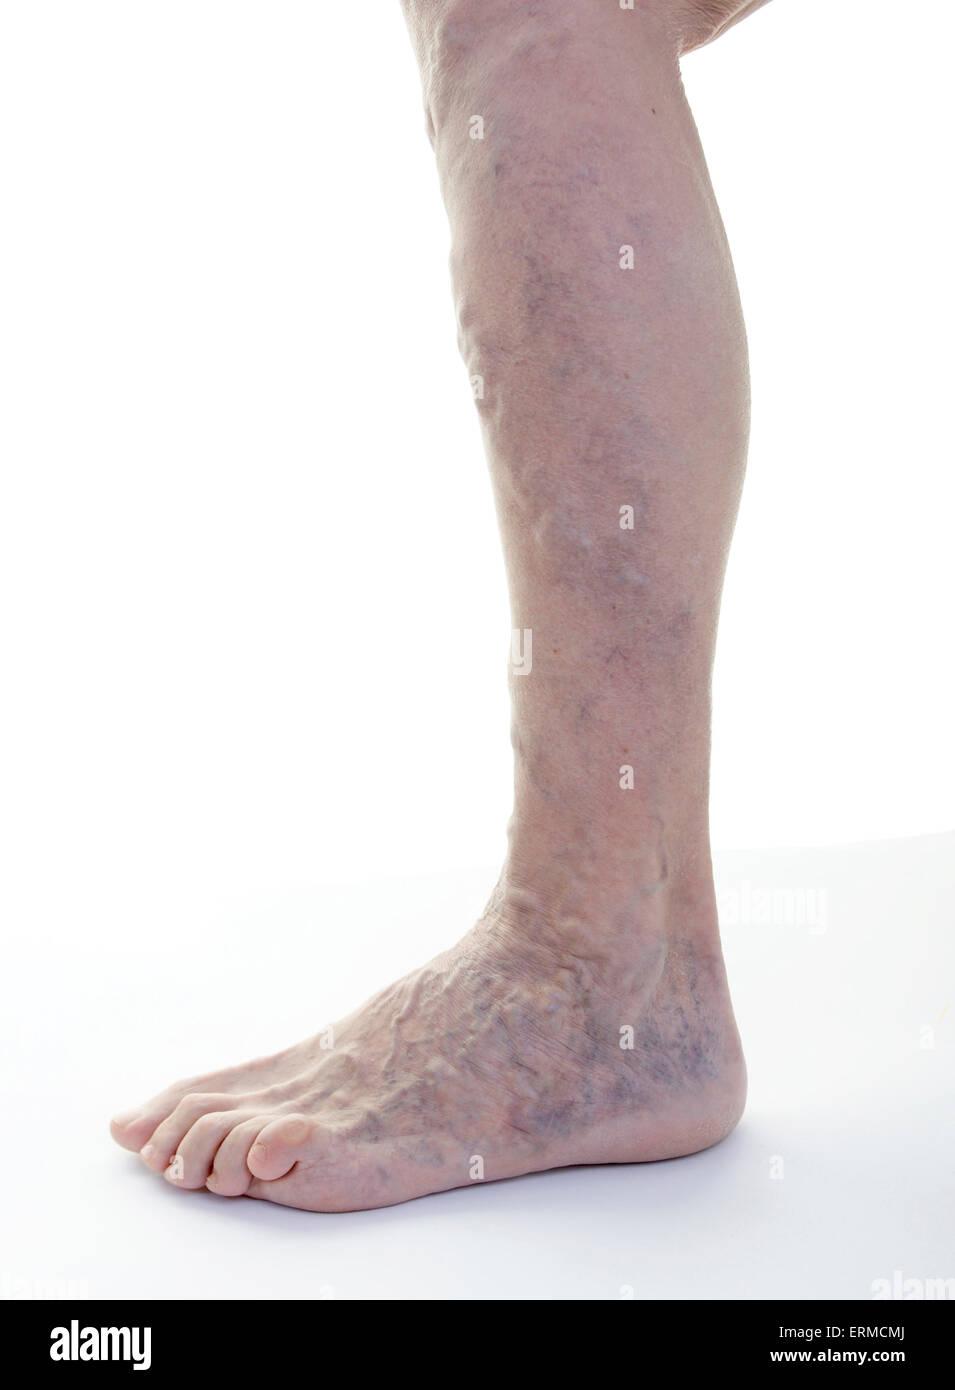 Varices jambe (femme, l'âge de 68 ans) / Krampfadern Varizen suis Bein (Frau, modifier 68 Jahre) Photo Stock